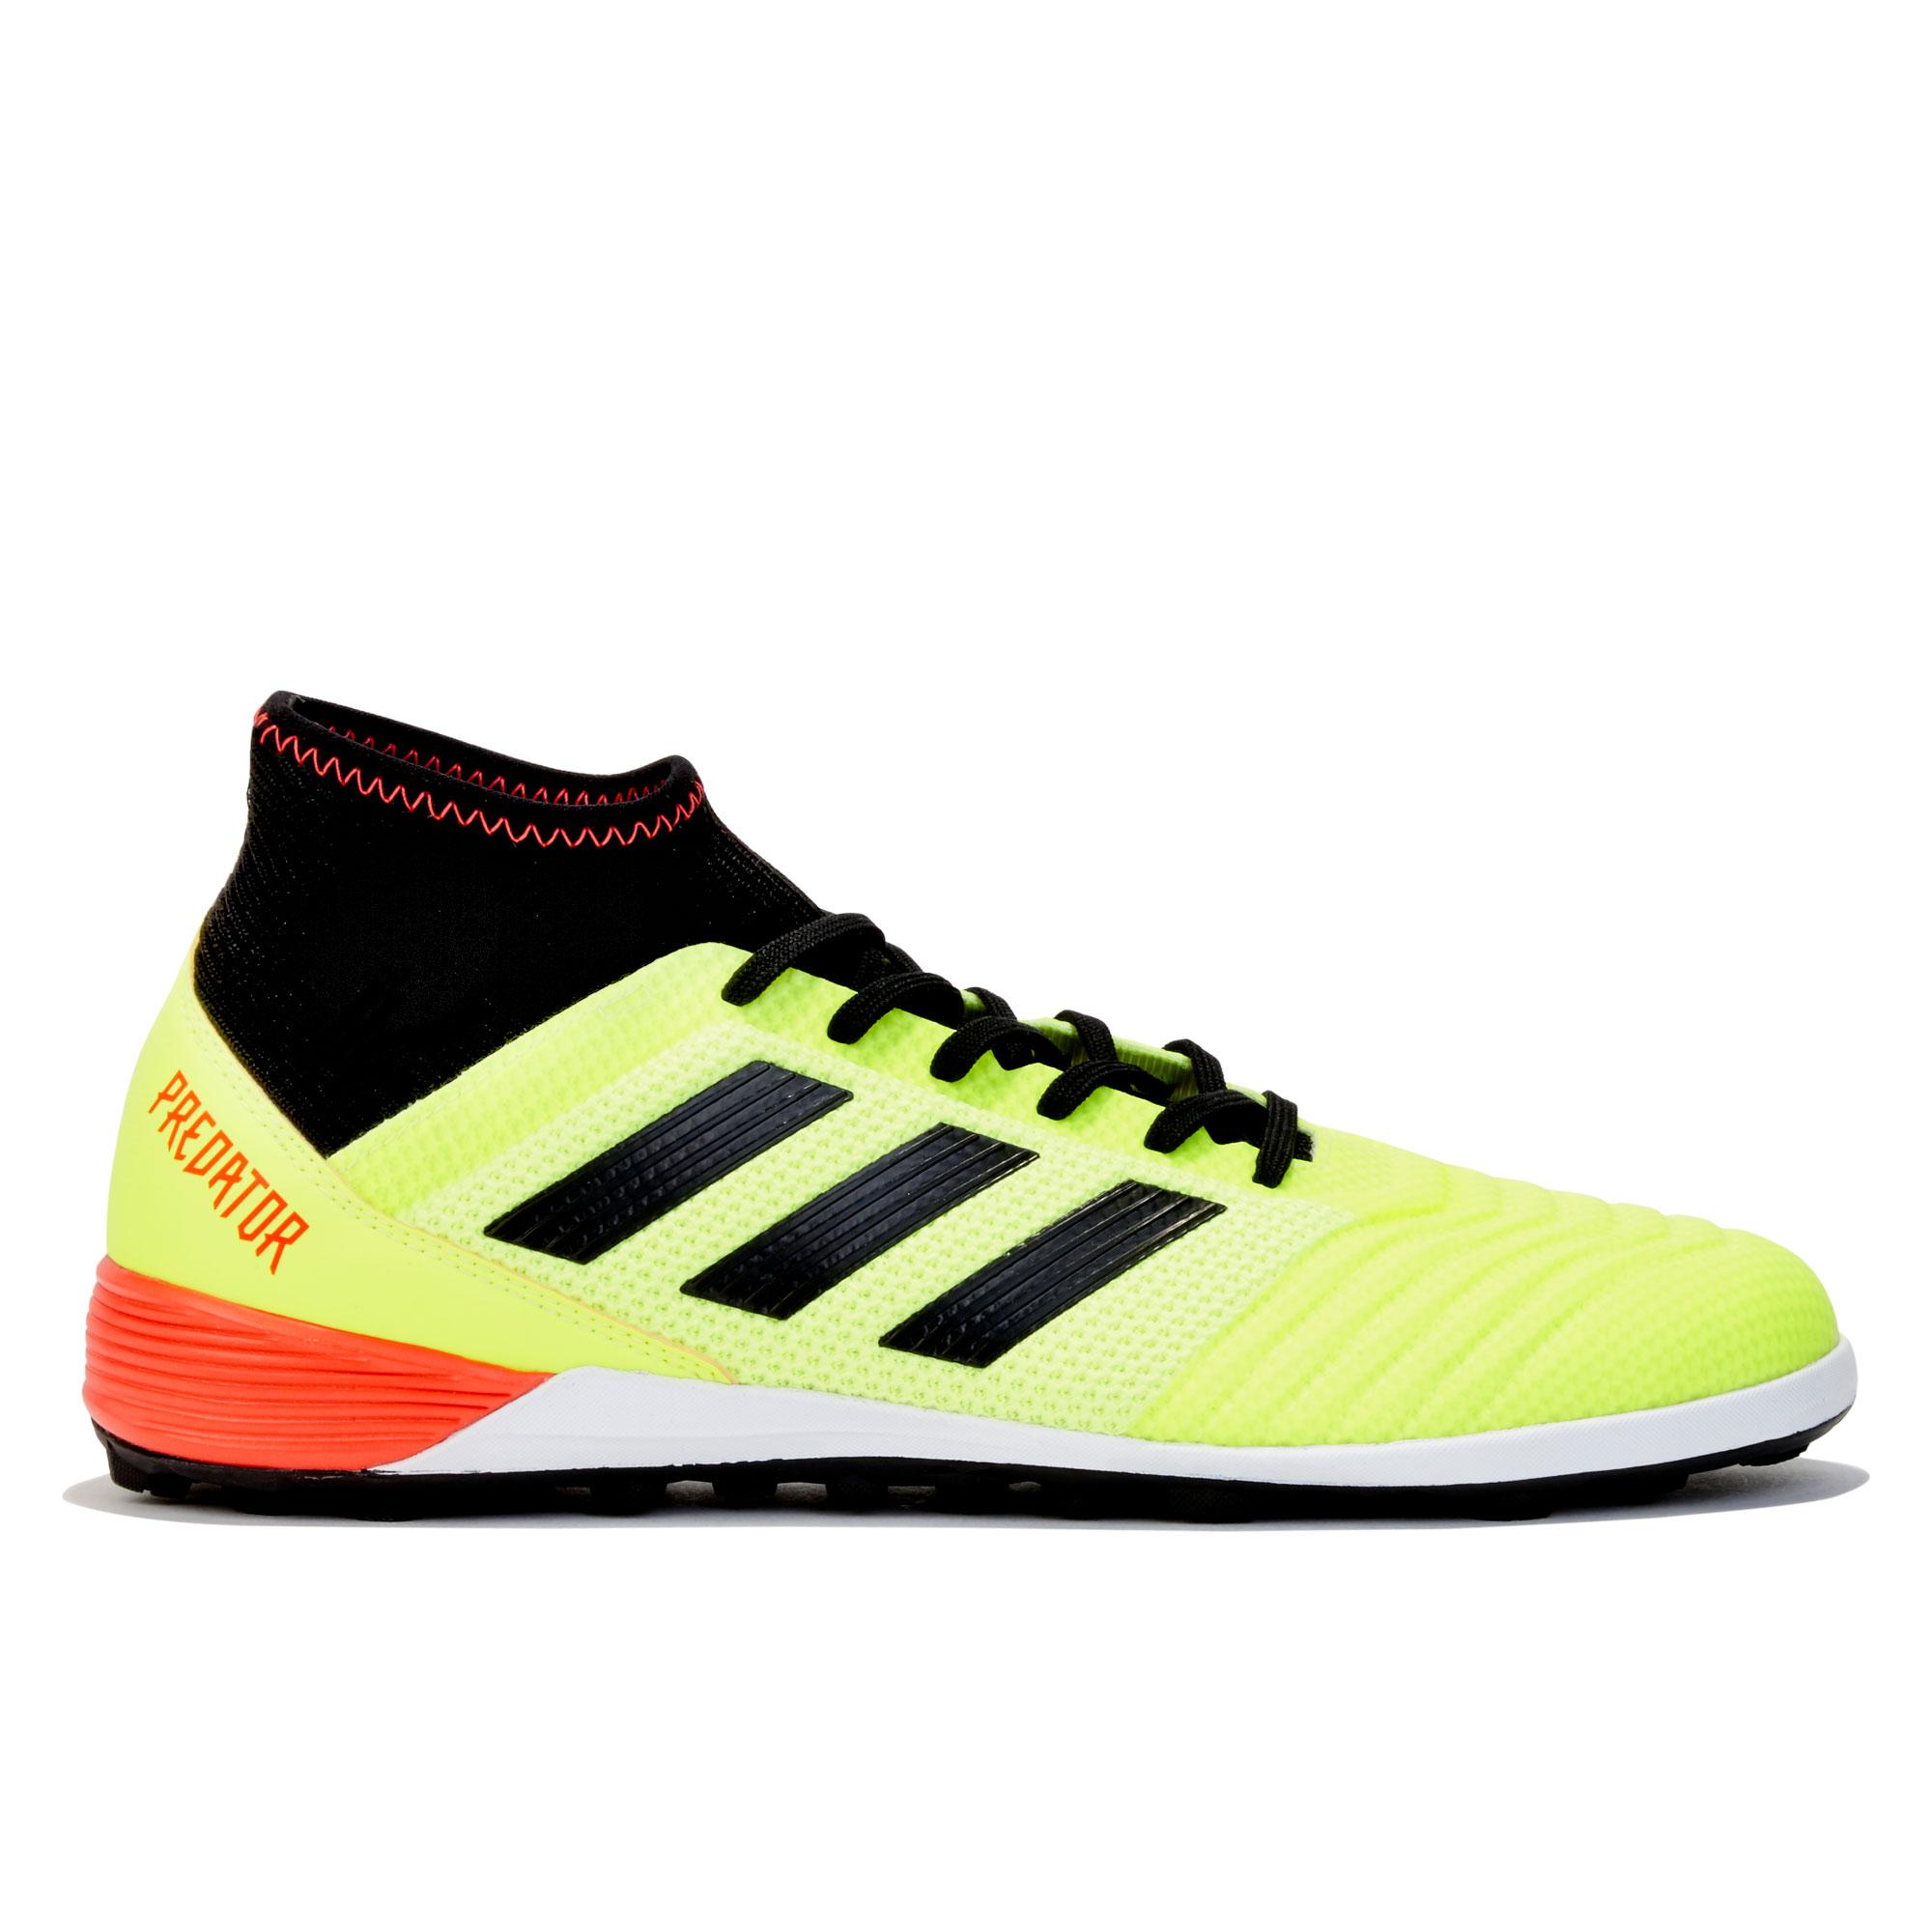 Image of adidas Predator Tango 18.3 Astroturf Trainers - Yellow